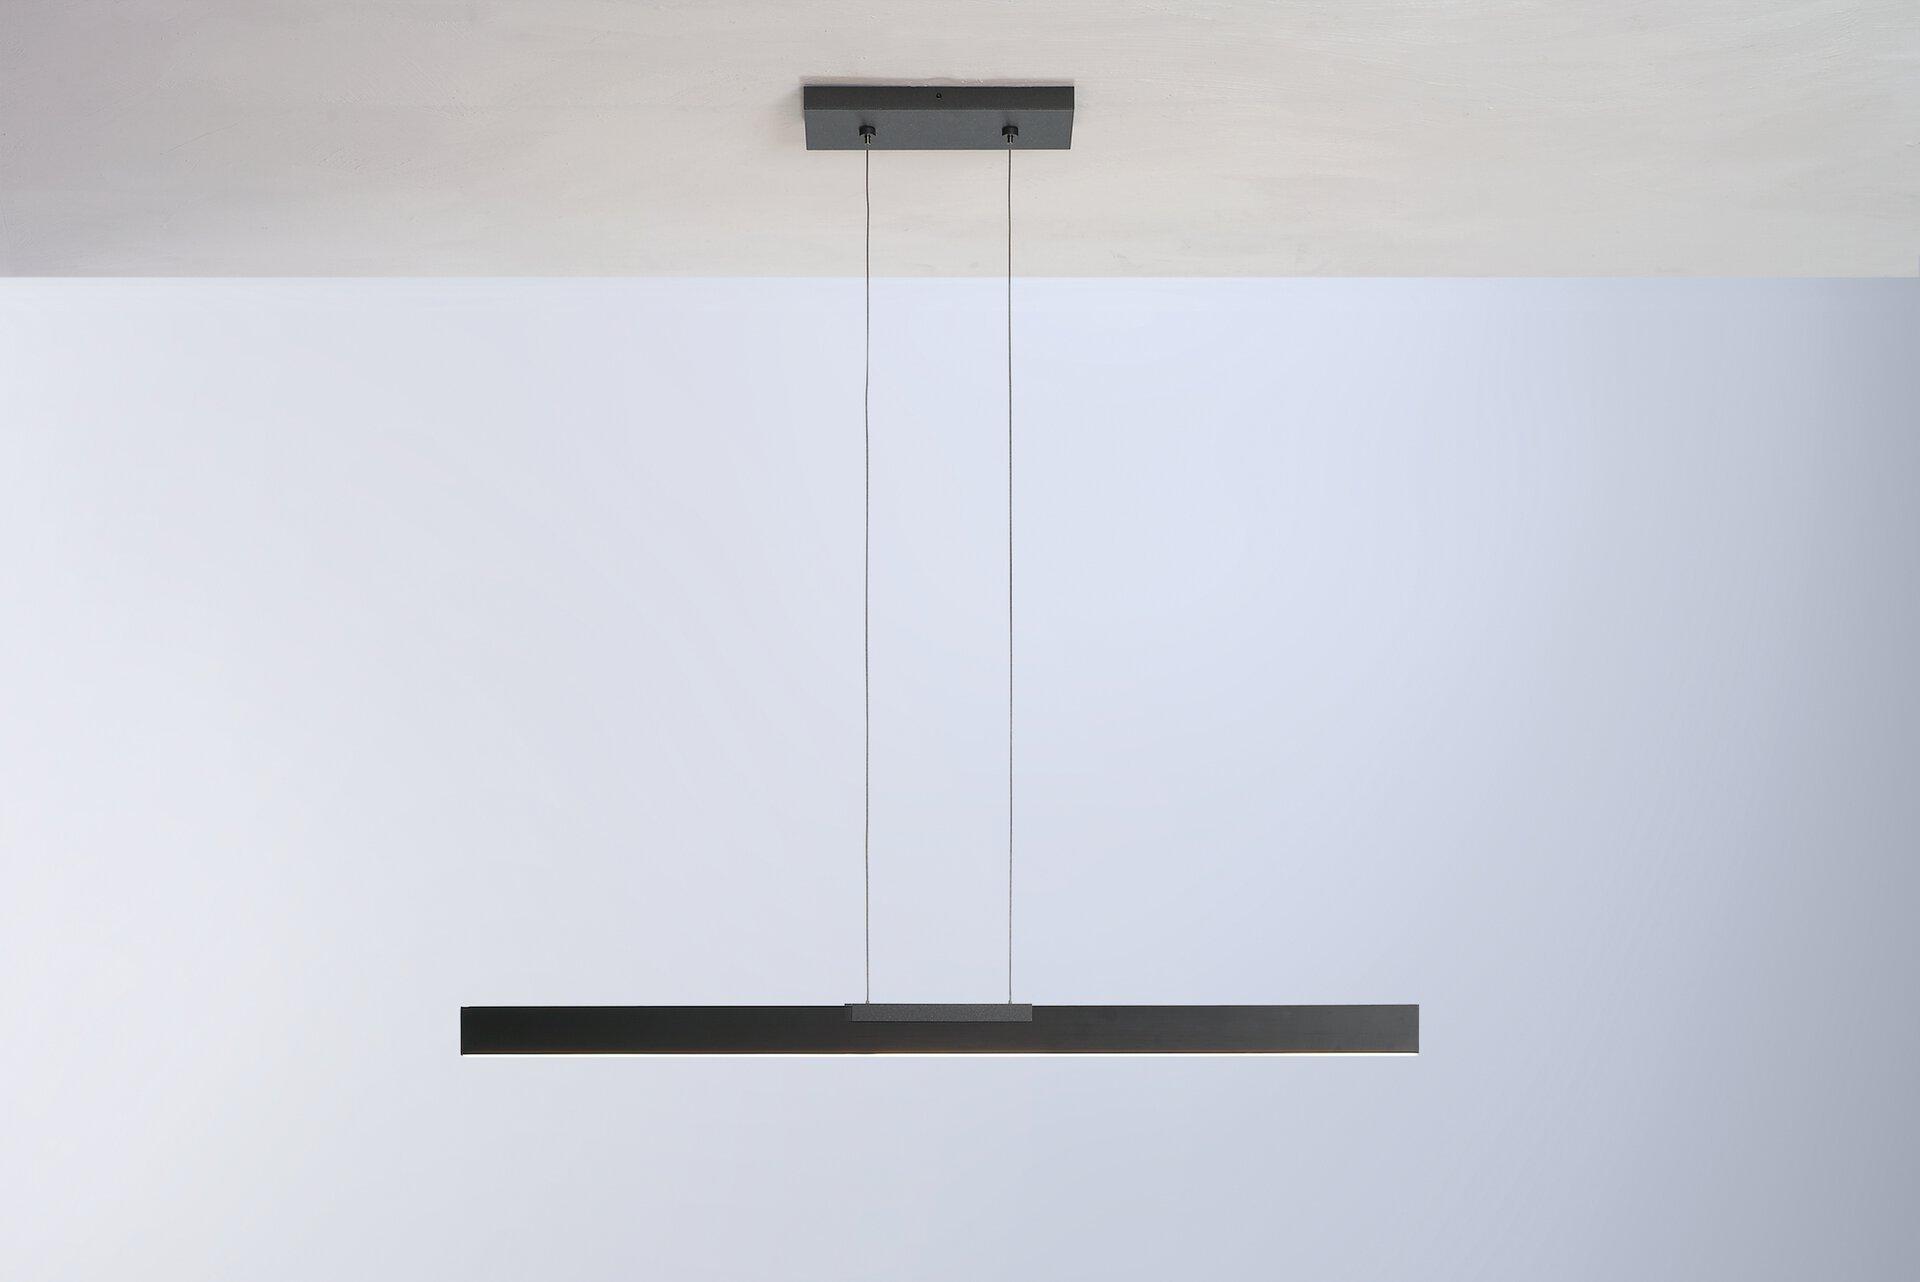 Pendelleuchte NANO Bopp Metall schwarz 1 x 140 x 101 cm